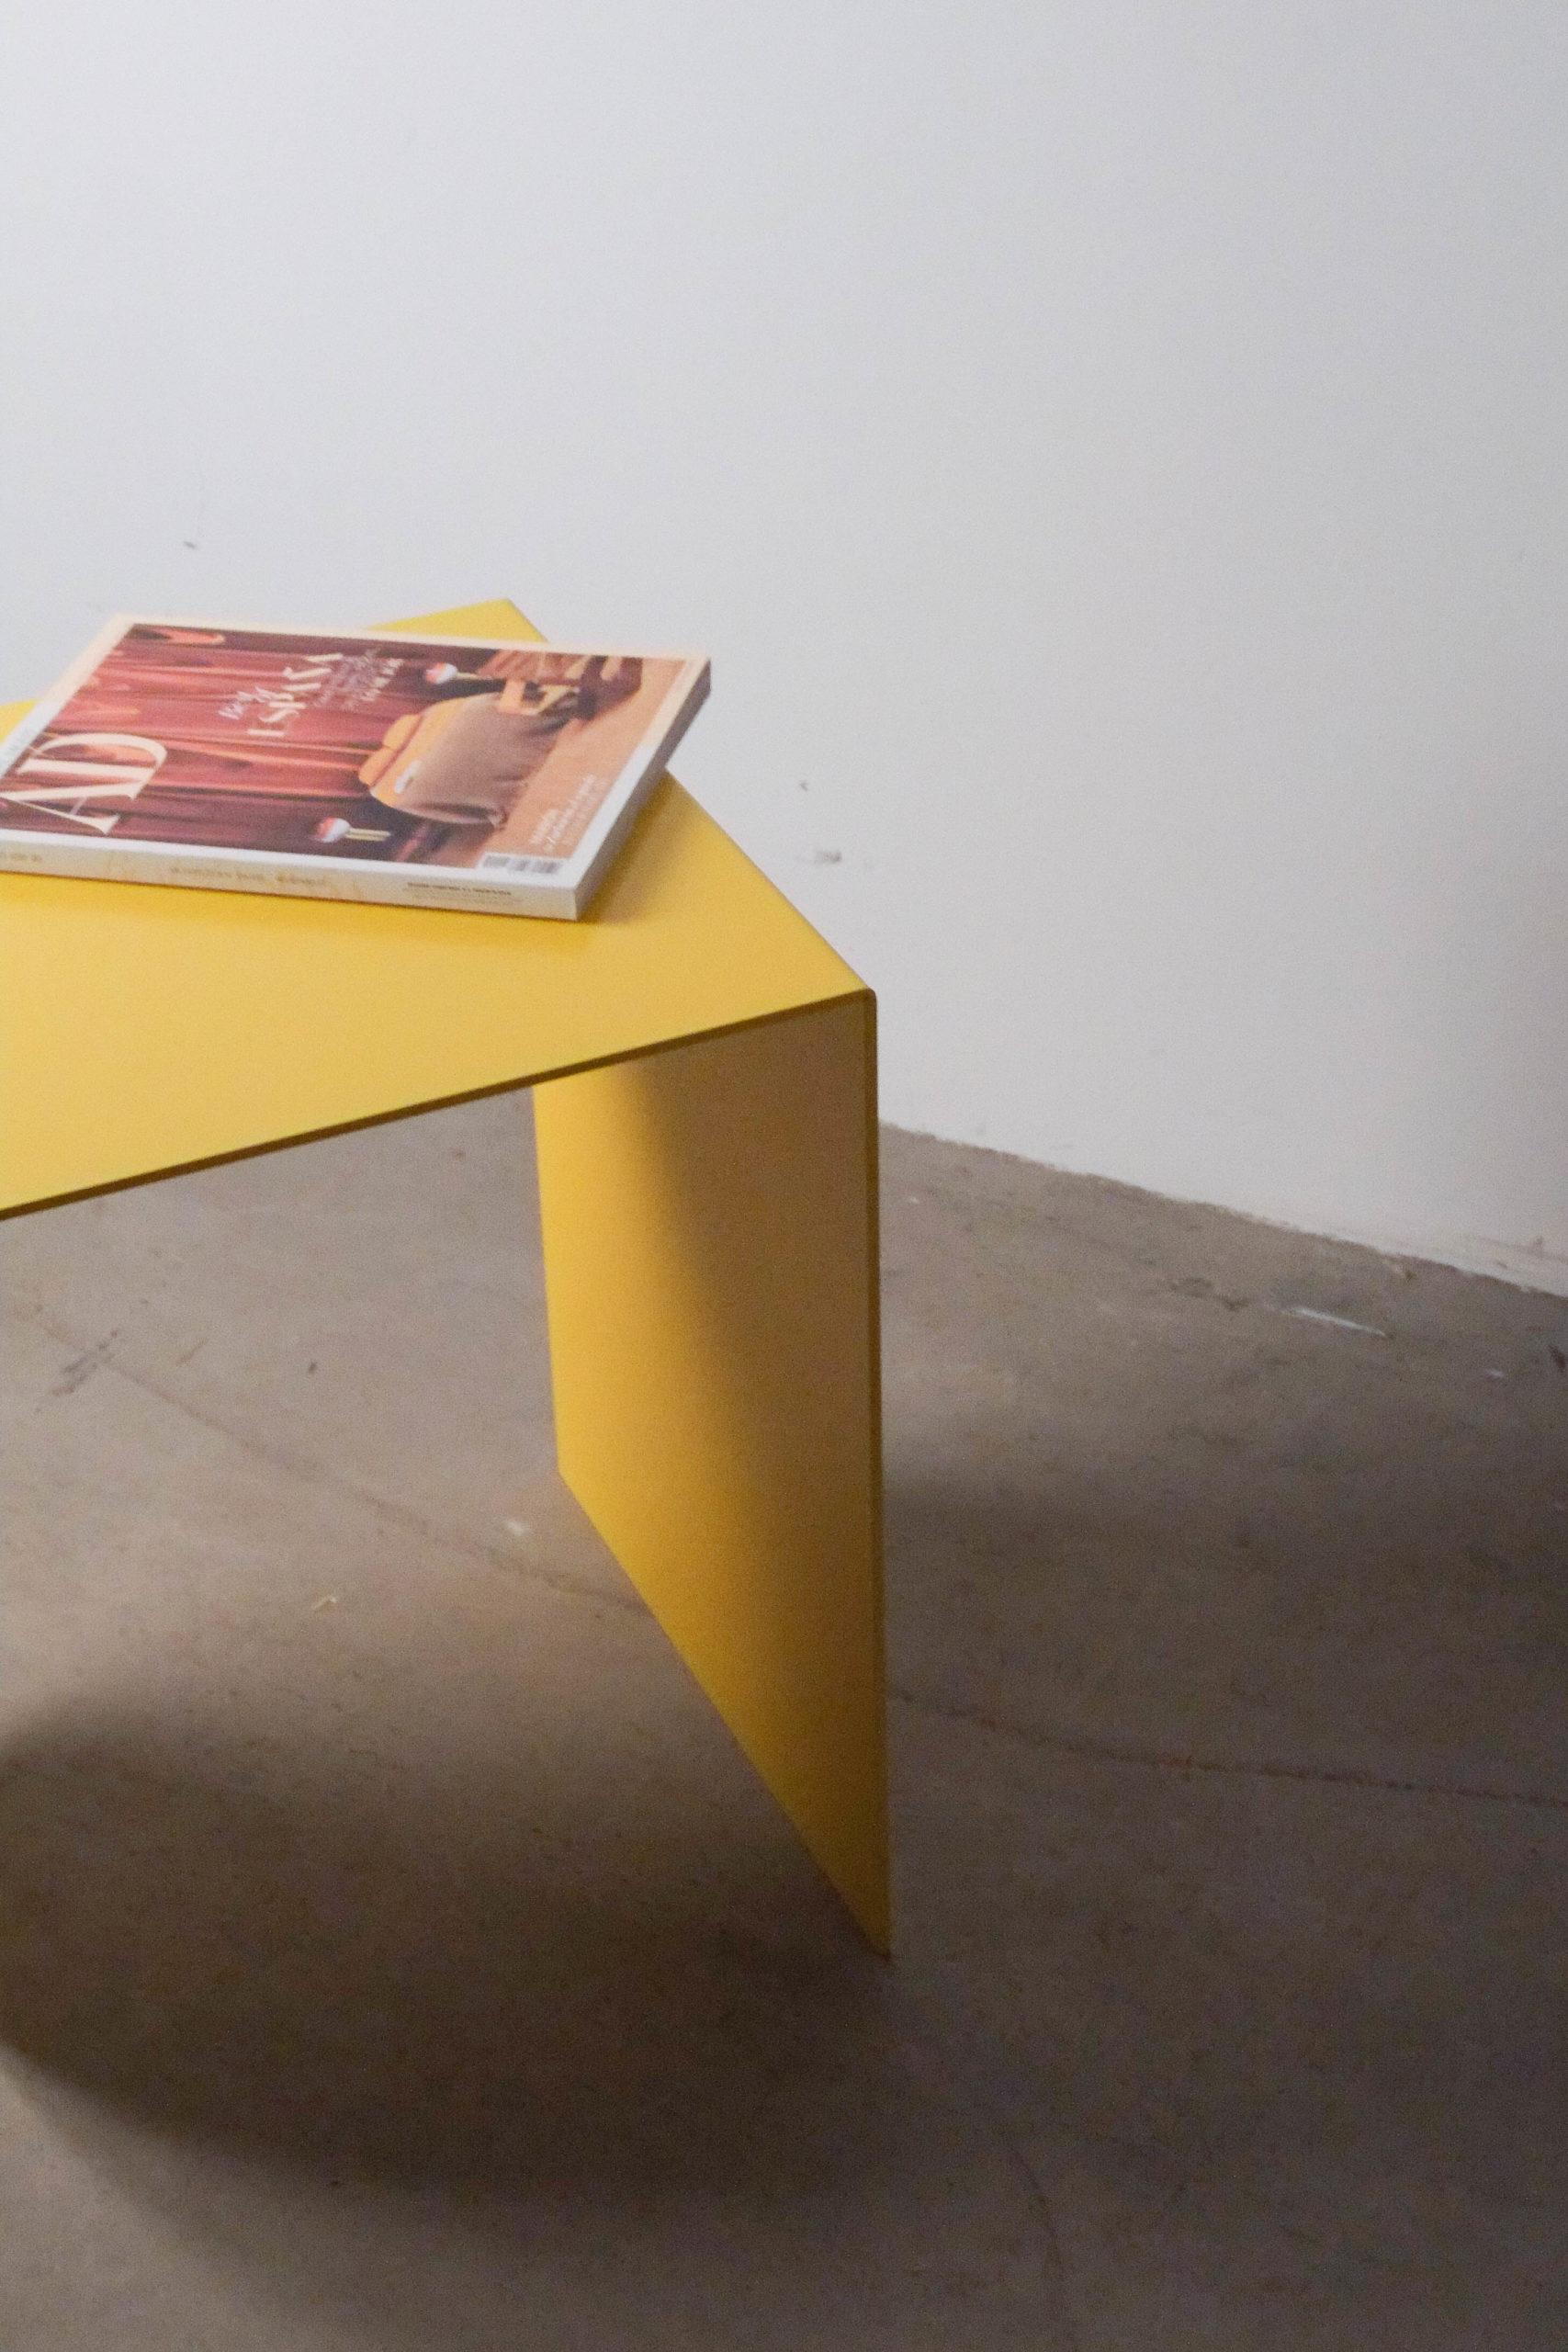 mesita amarilla de metal